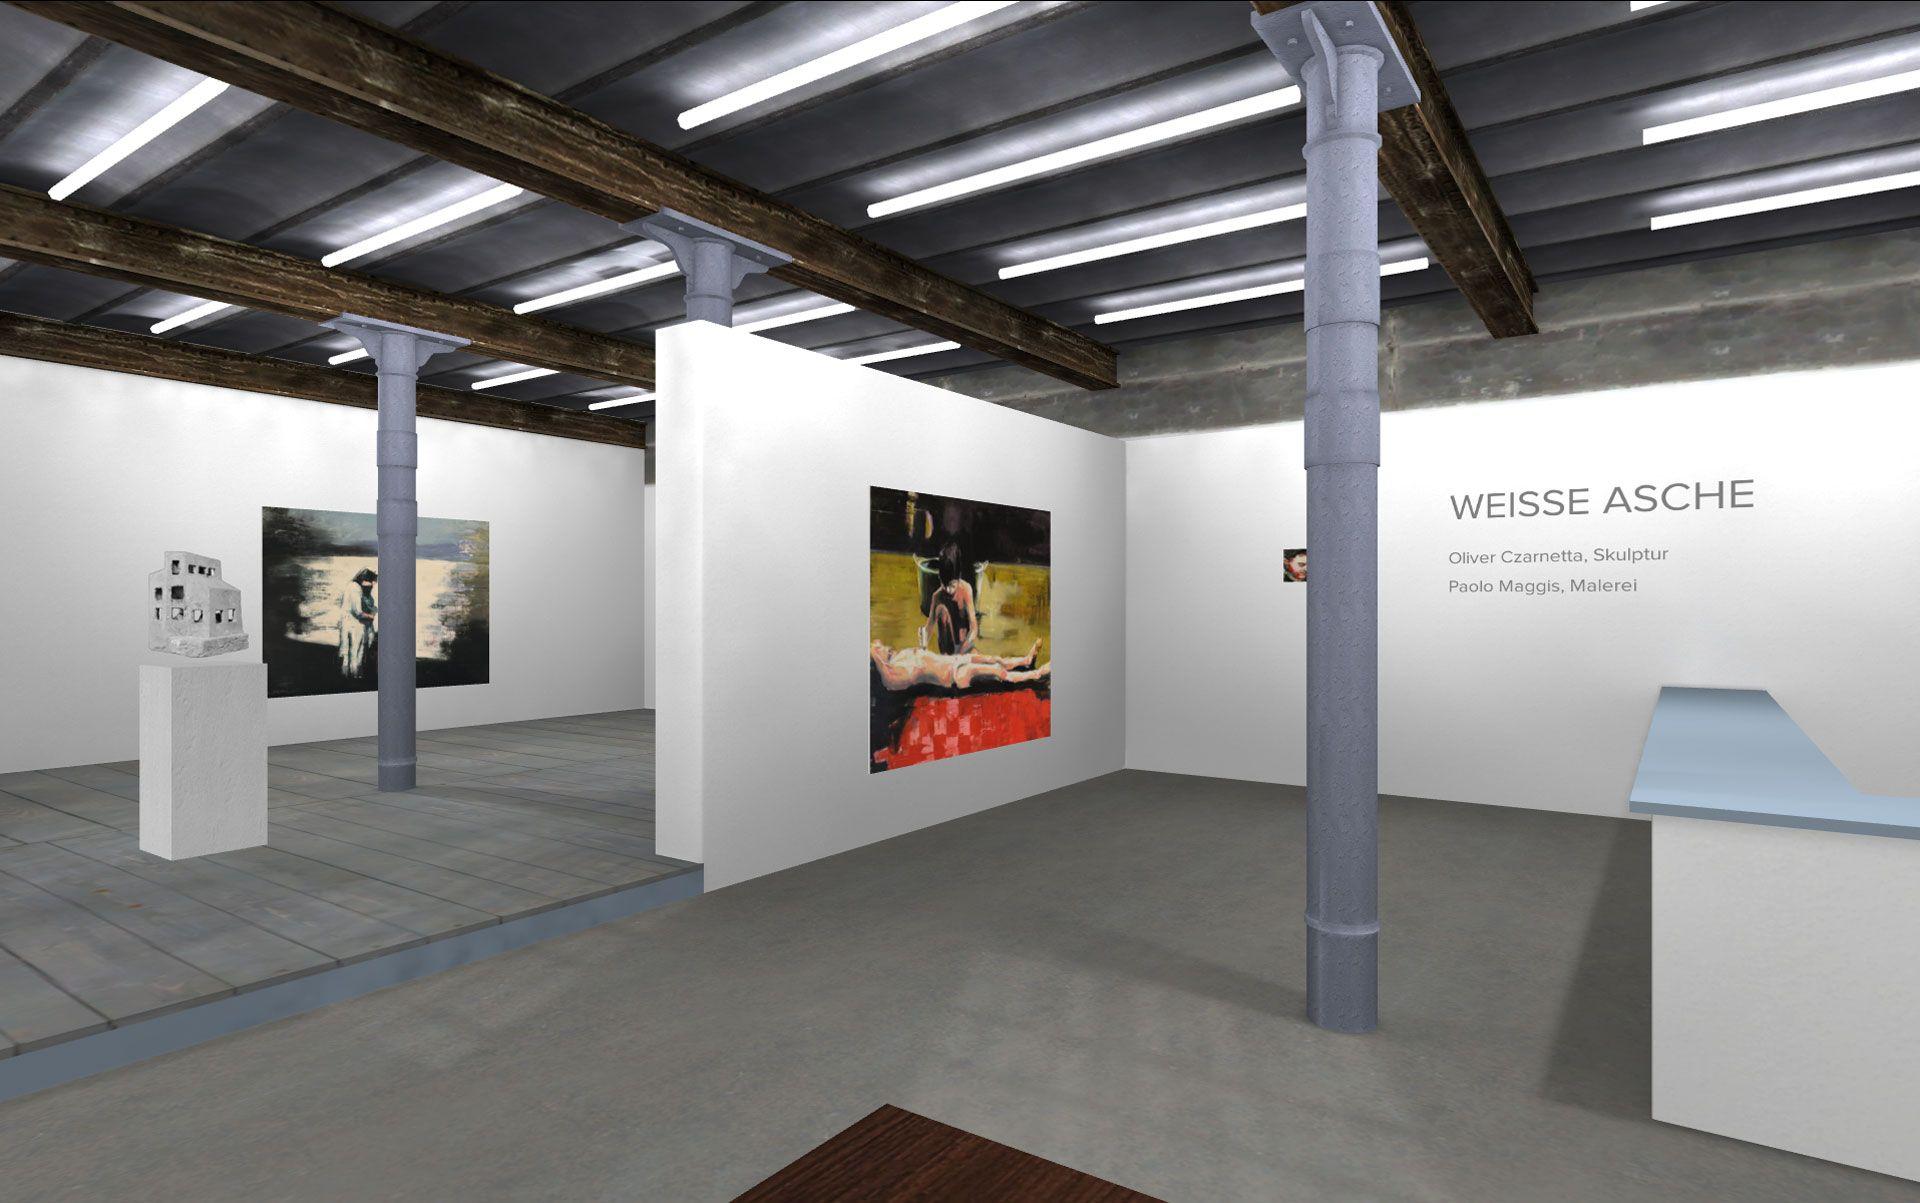 walkthrough virtual 3D online gallery by Queen Anne. powered by 3D STELLWERK Leipzig.